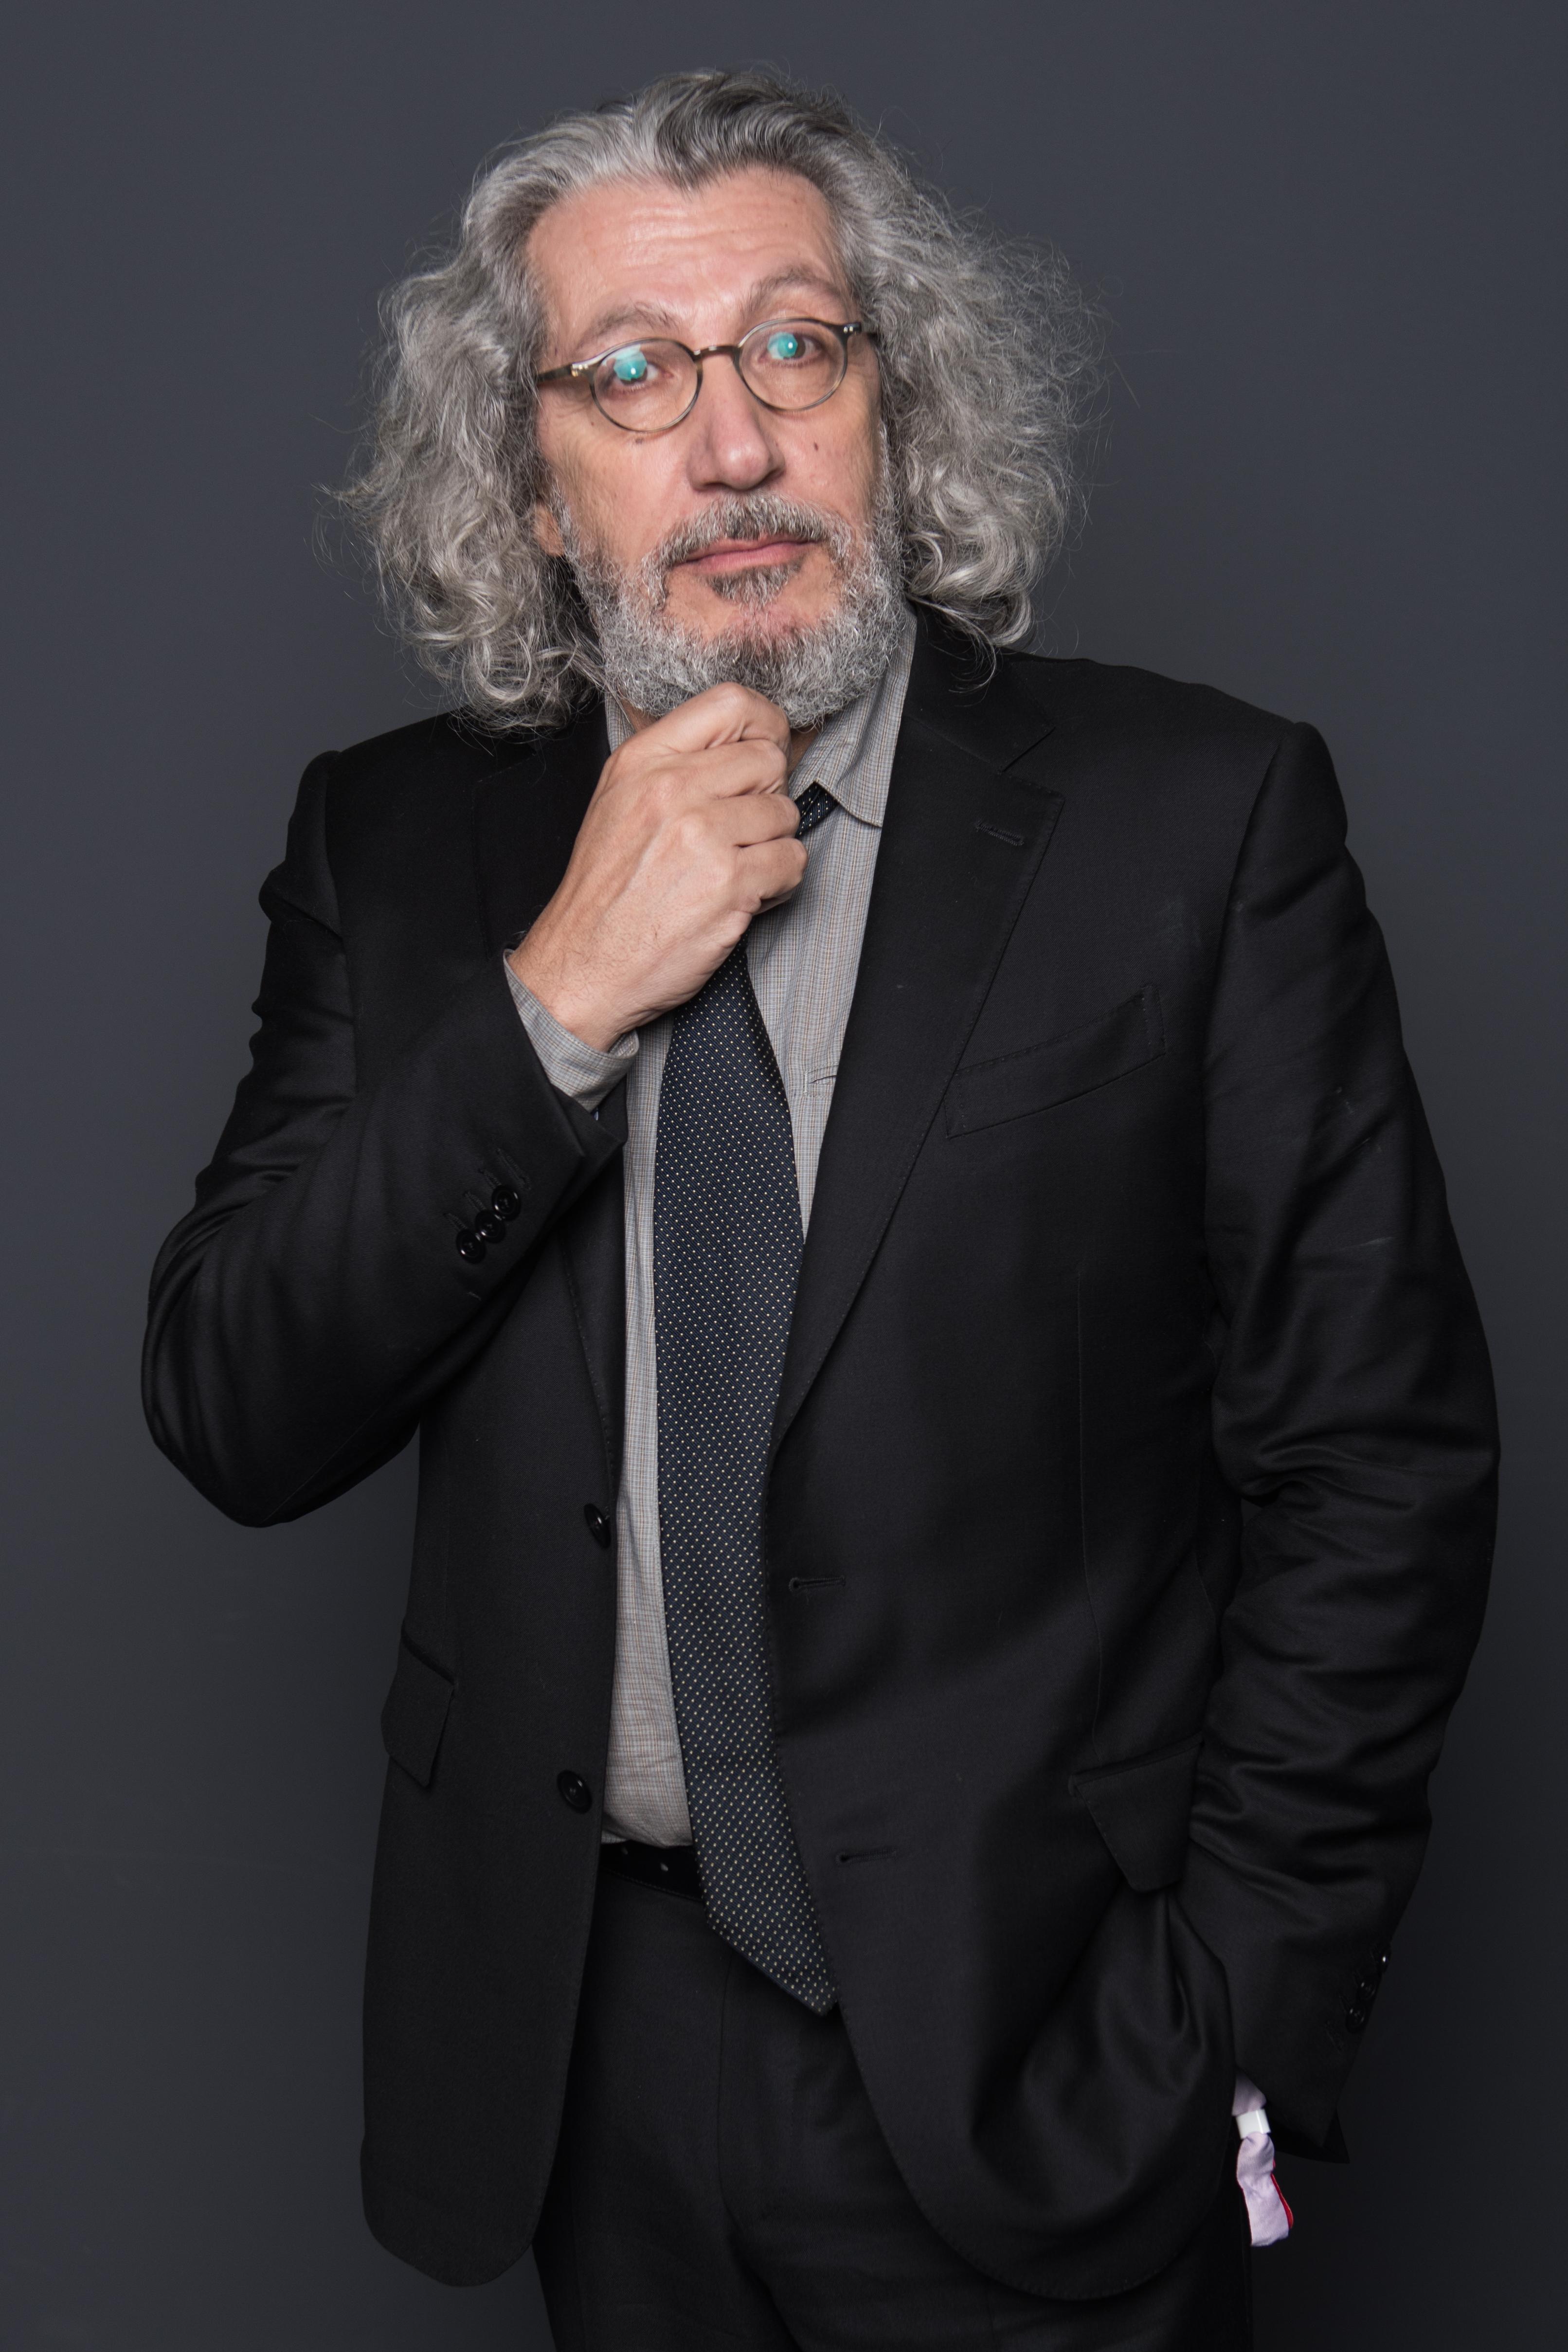 Alain Chabat